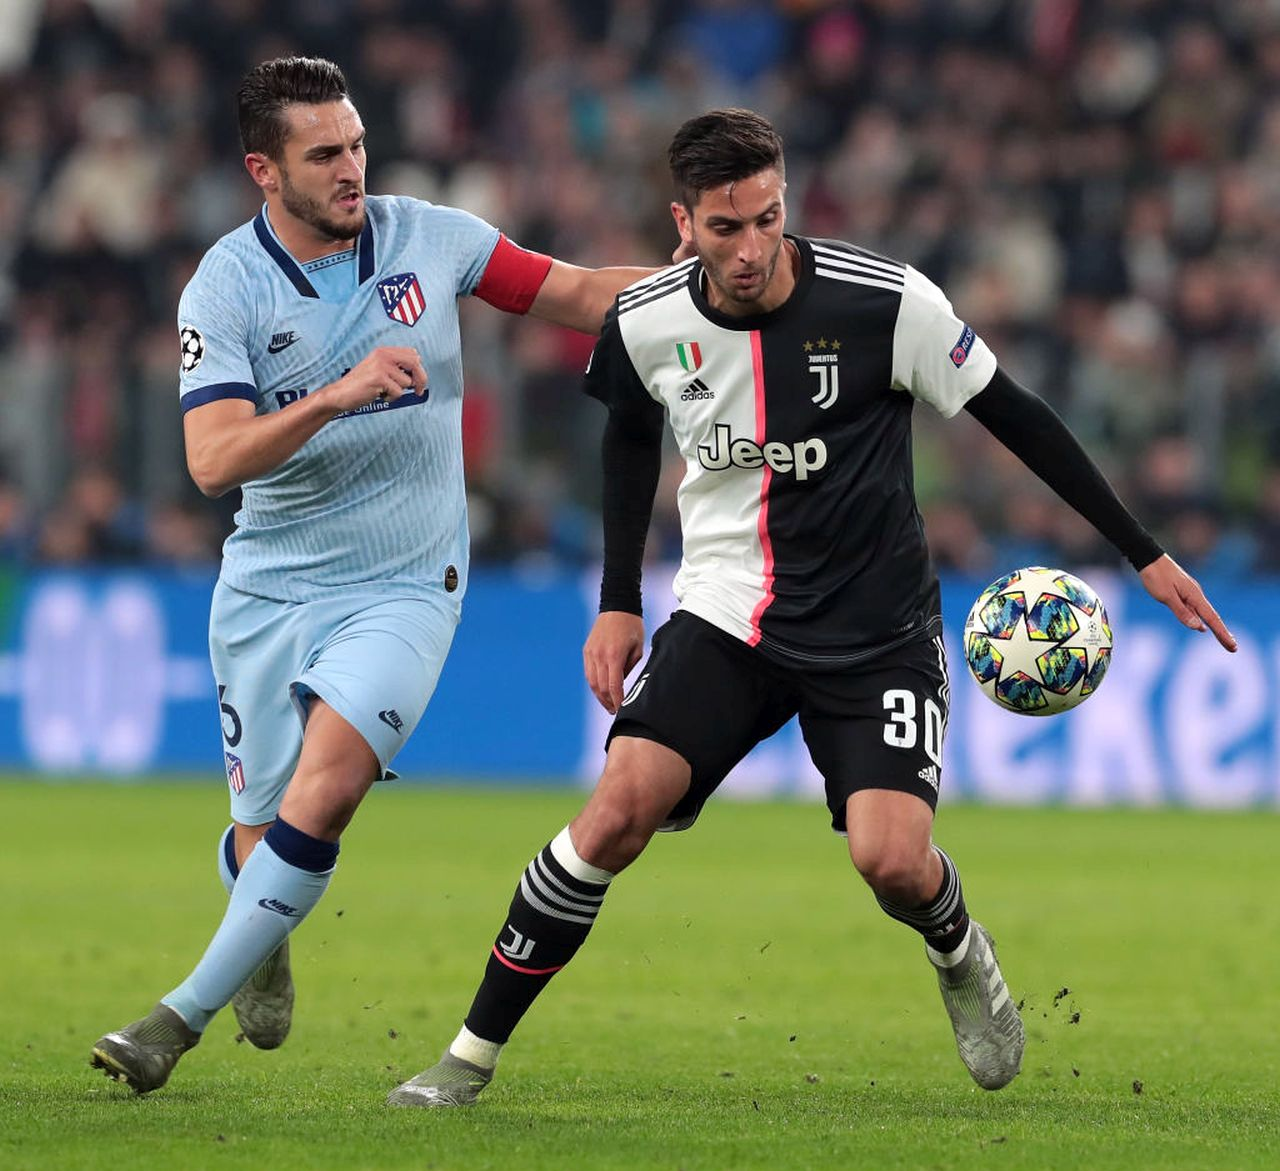 Calciomercato Juventus | Bentancur, tolta la clausola di rivendita